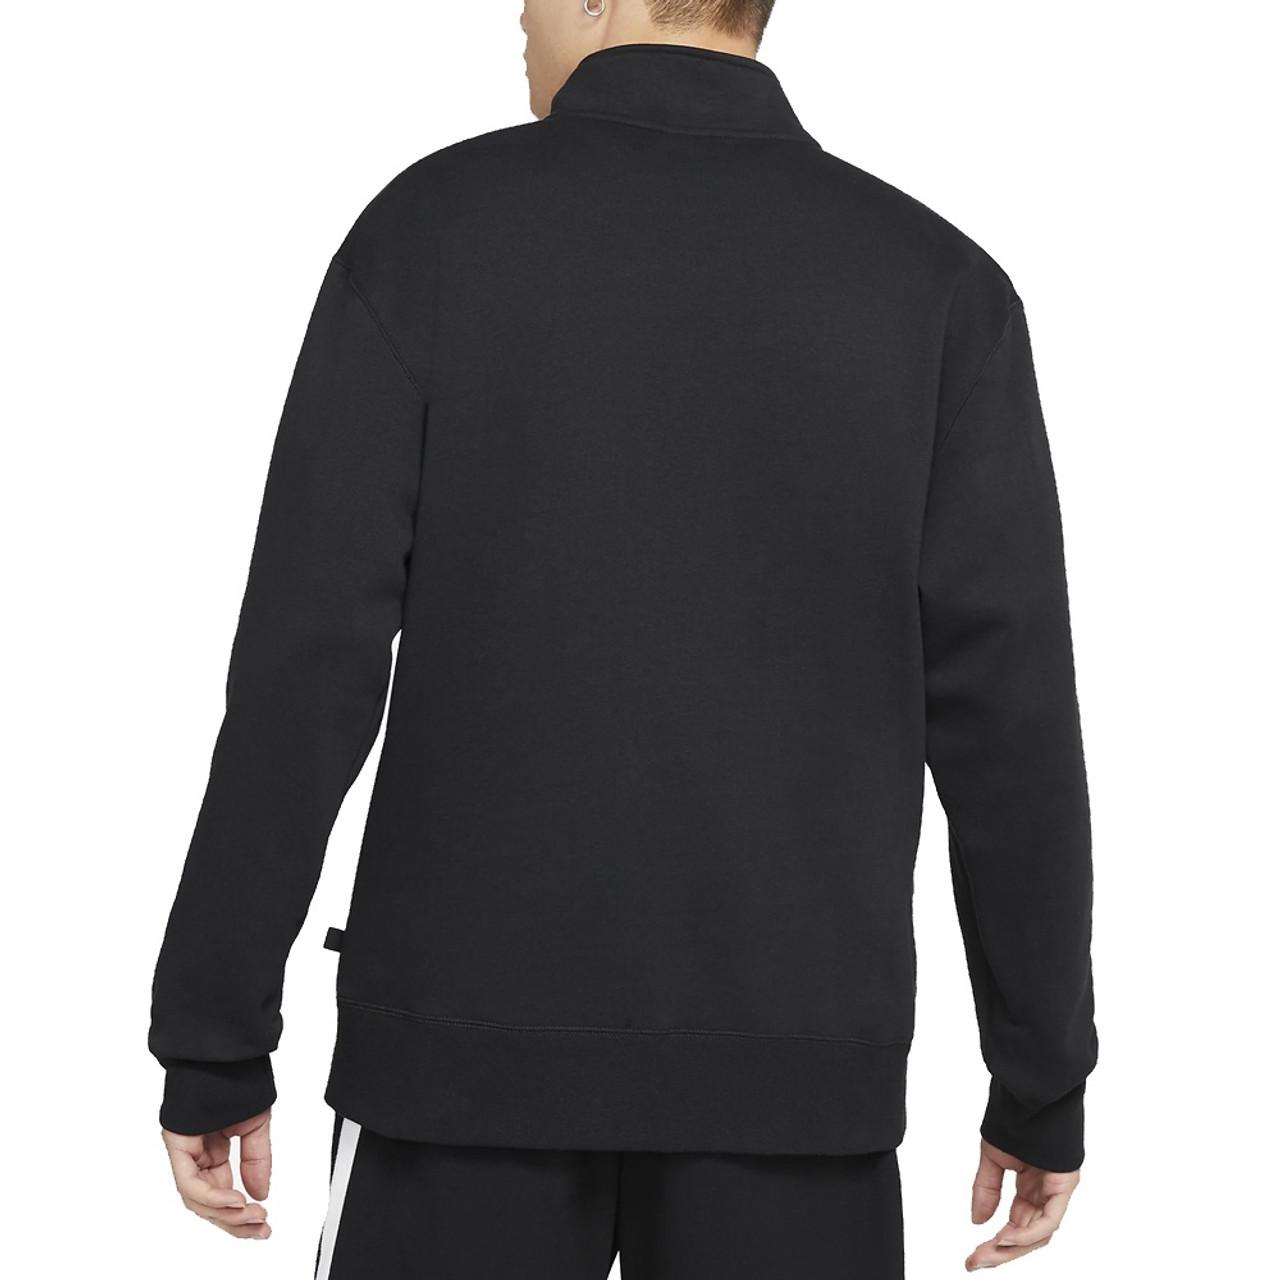 NIKE SB March Radness Mockneck Quarter Zip Black